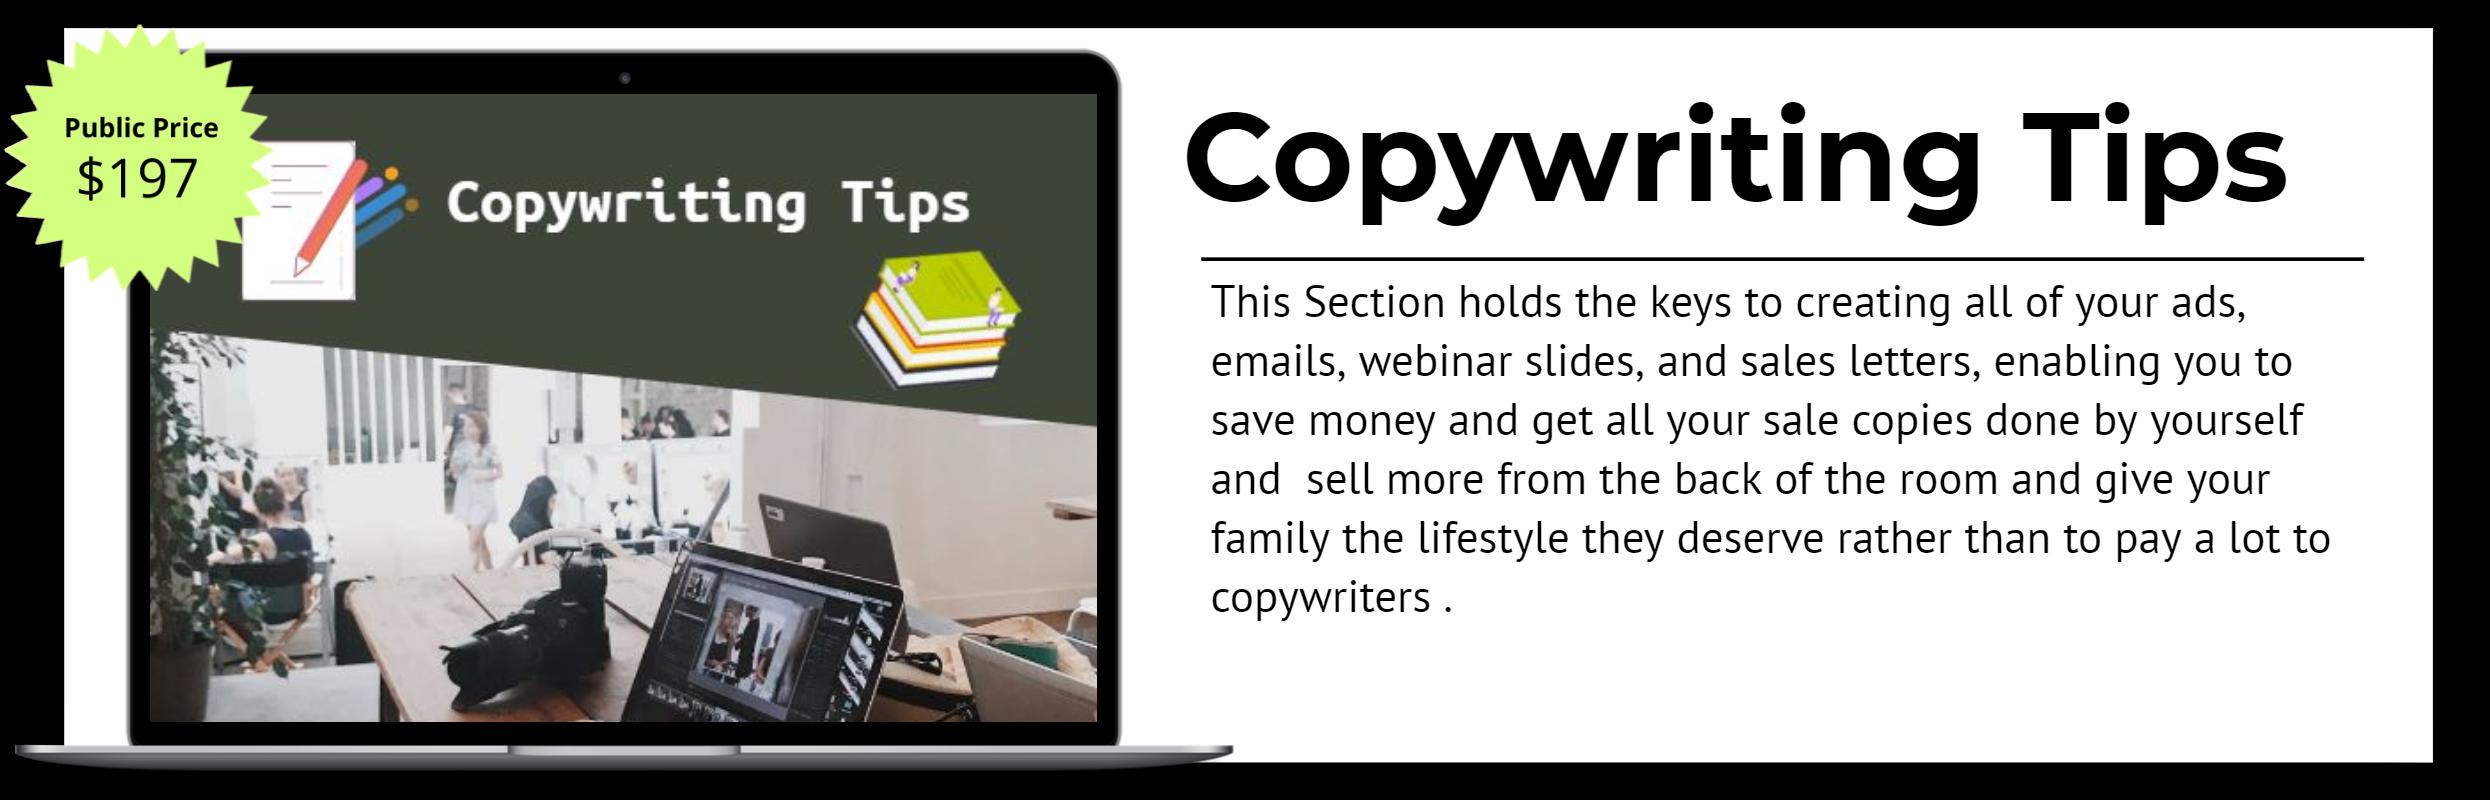 Copywriting tips (1)